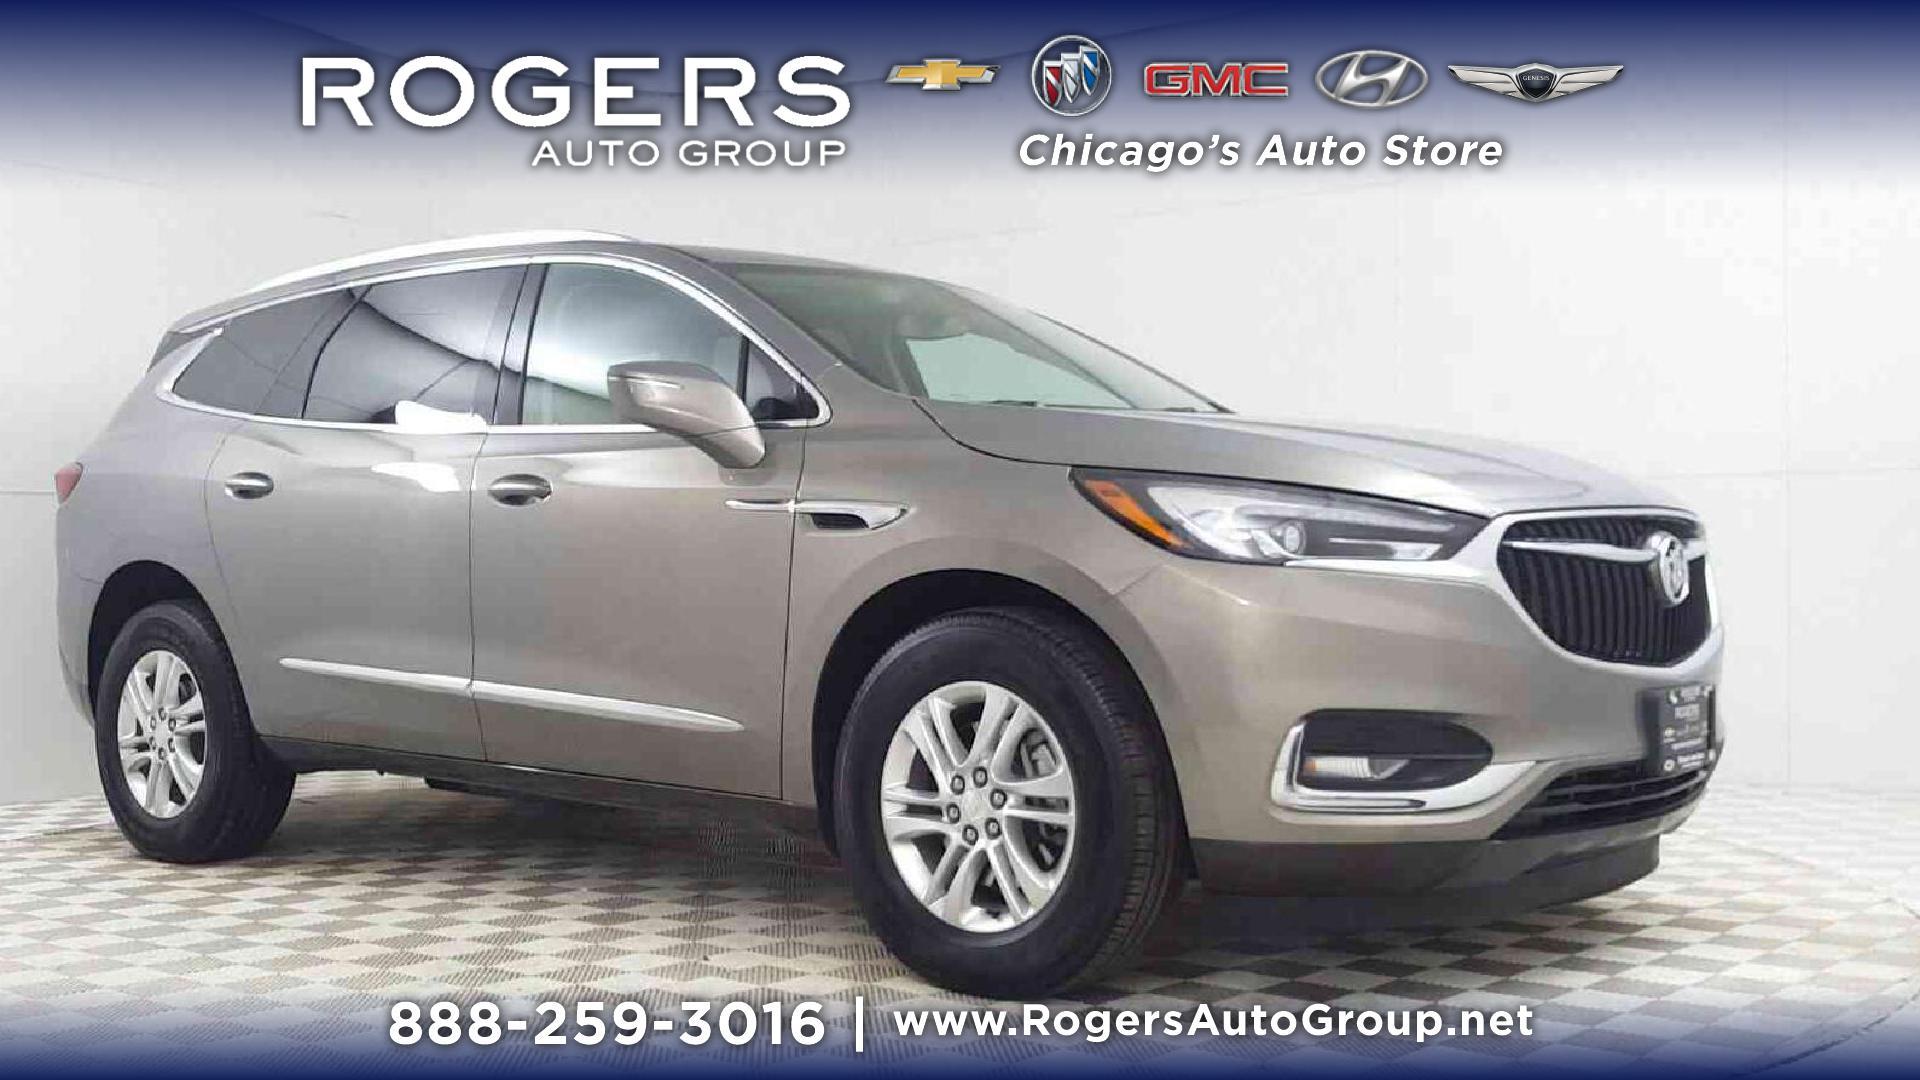 2019 Buick Enclave for sale in Chicago - 5GAEVAKW3KJ159267